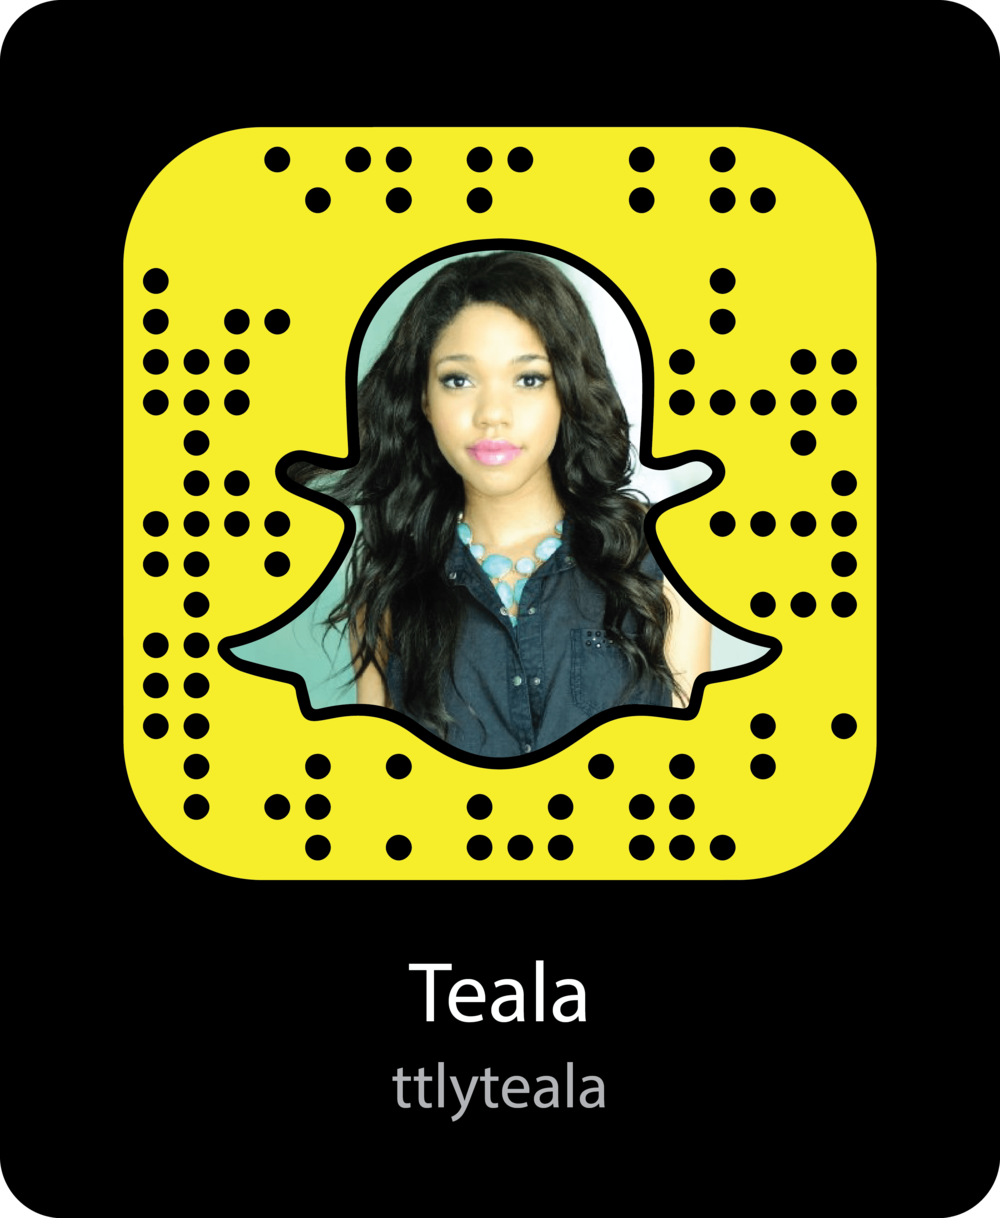 teala-youtube-celebrity-snapchat-snapcode